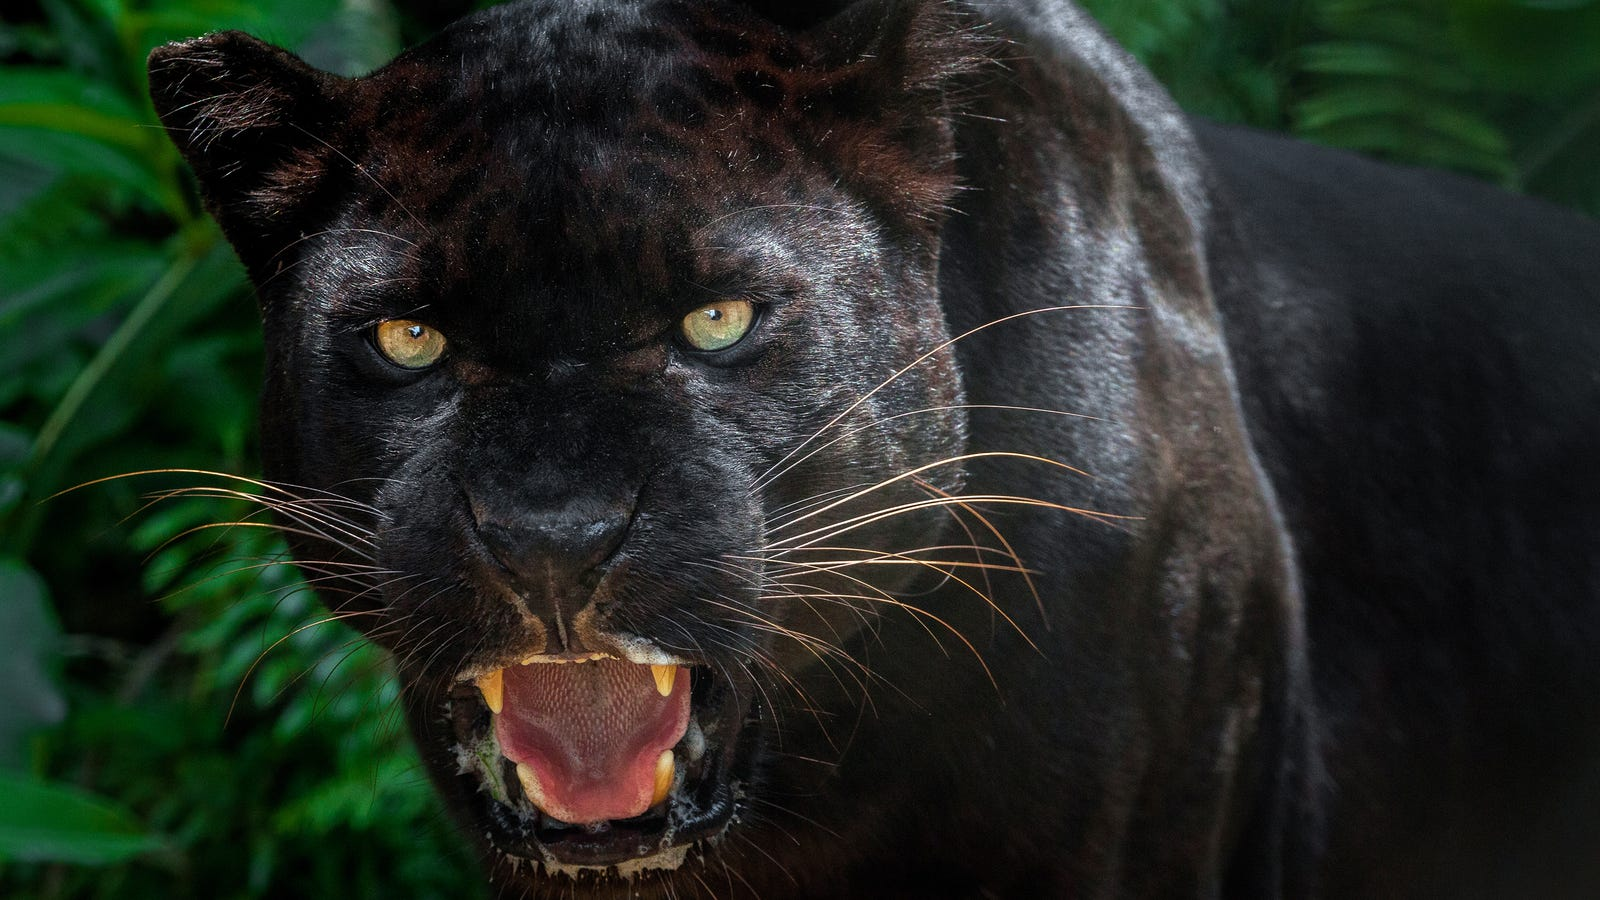 Scientists Photograph Rare Black Leopard in Kenya - photo#1